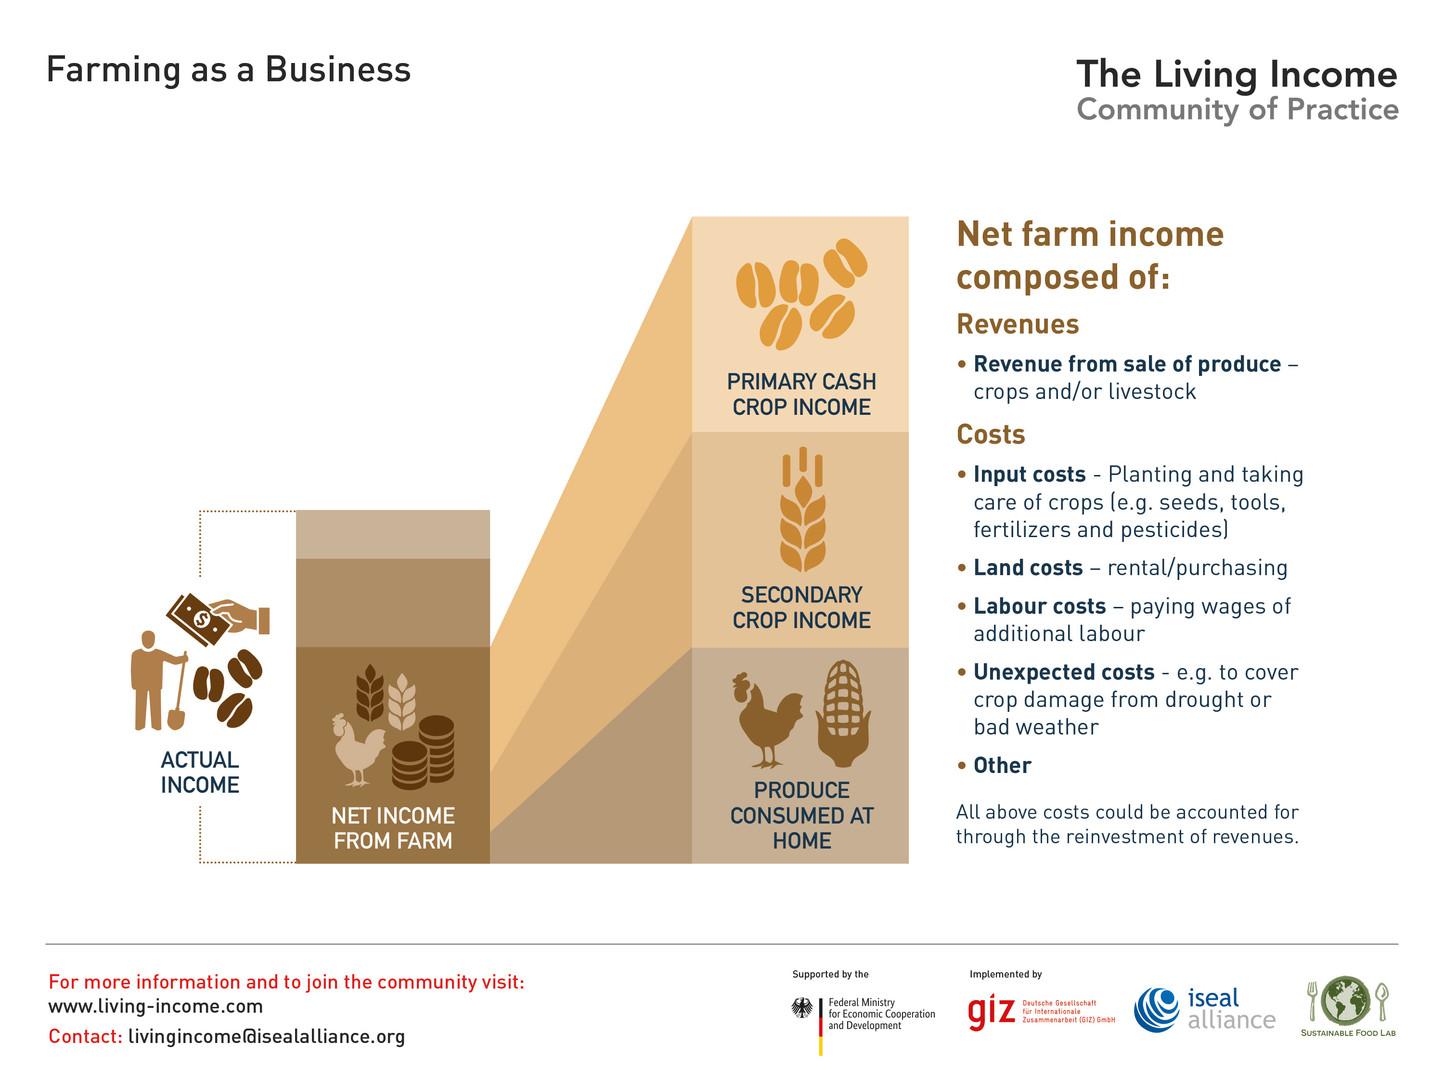 Farming as a business - 2019 ©LivingIncomeCommunityofPractice